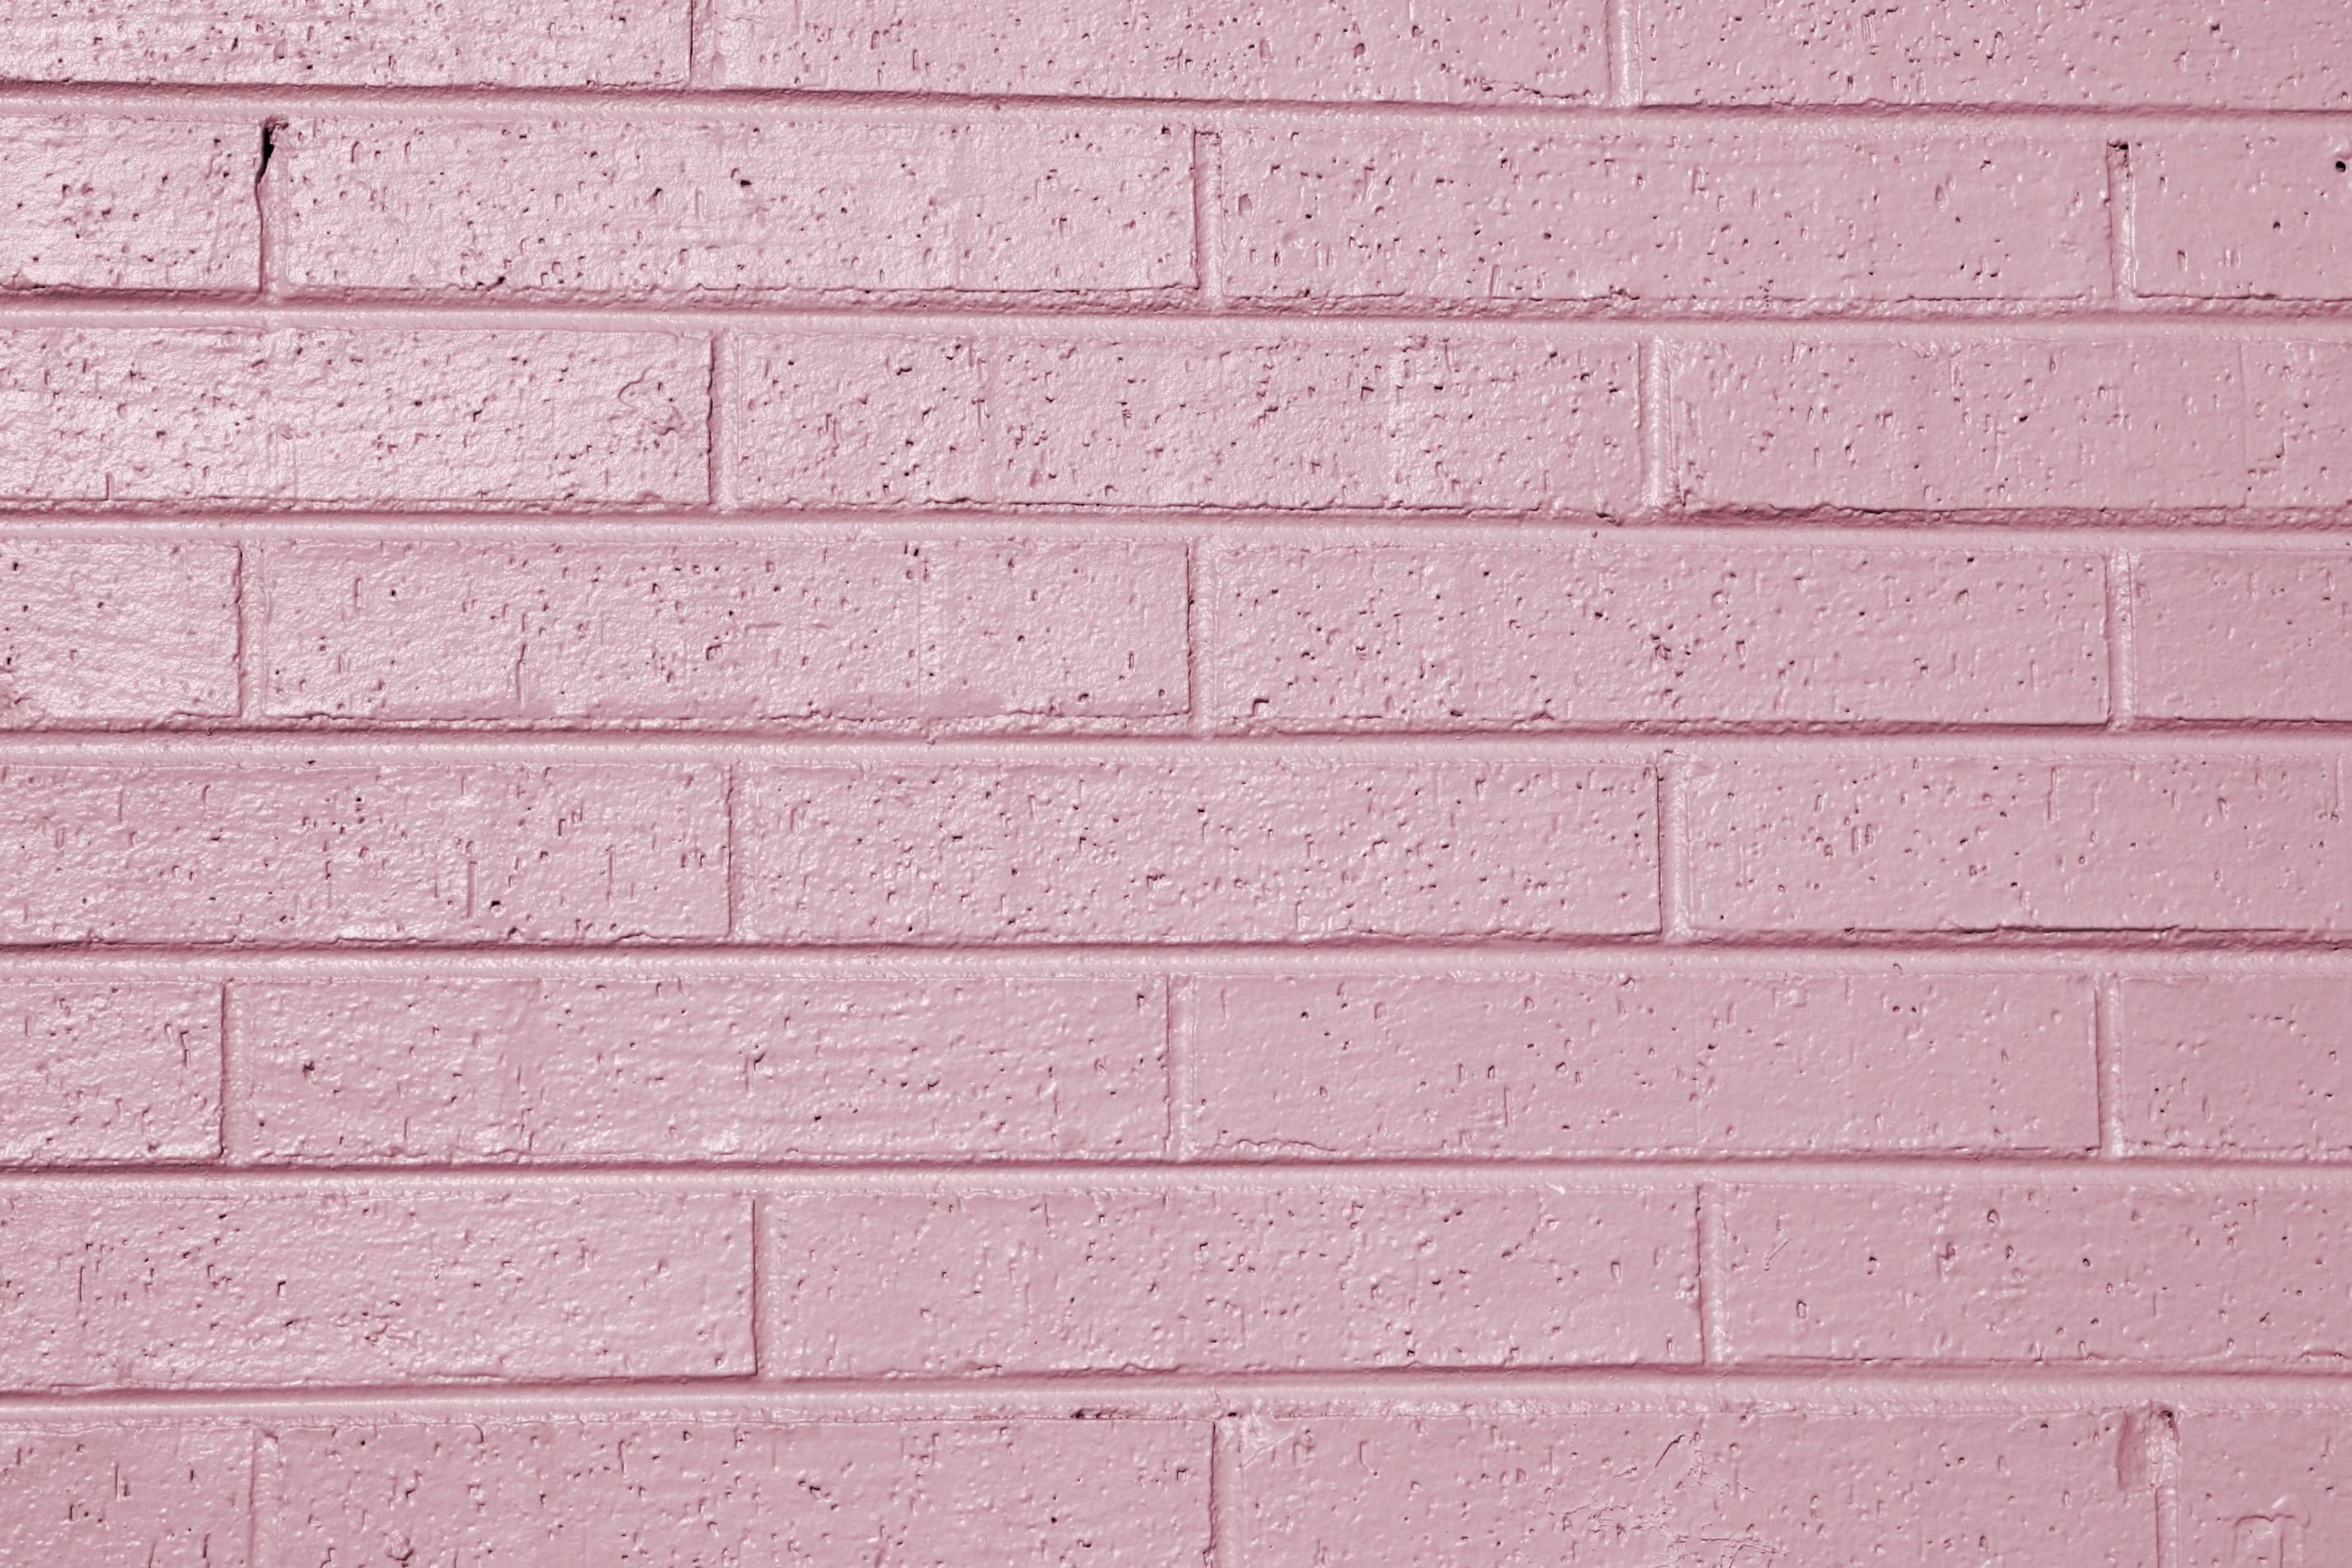 Textura ladrillos excellent ladrillo textura sin costura - Textura de pared ...